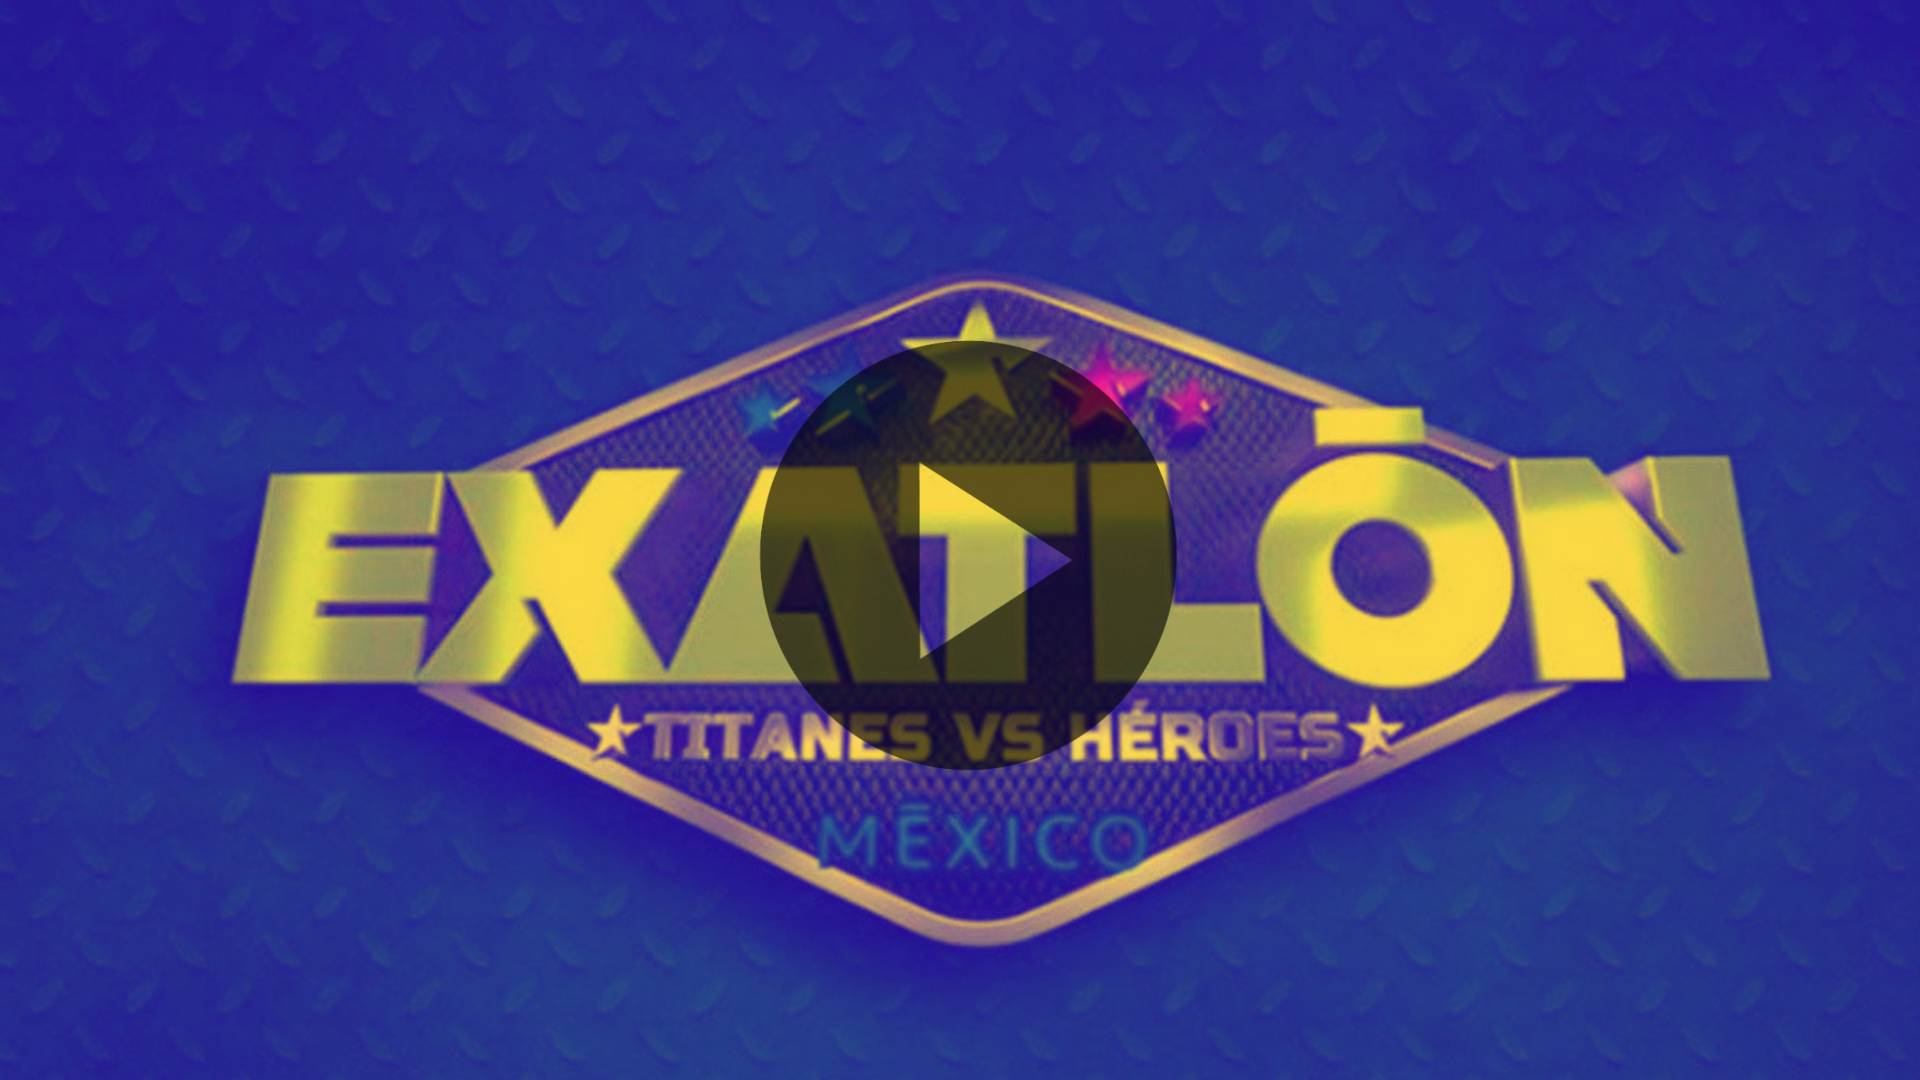 HOY EN VIVO: EXATLON MEXICO 2020: CONTINUA LA COMPETENCIA MAS VISTA DE MEXICO HOY TITANES VS HEROES